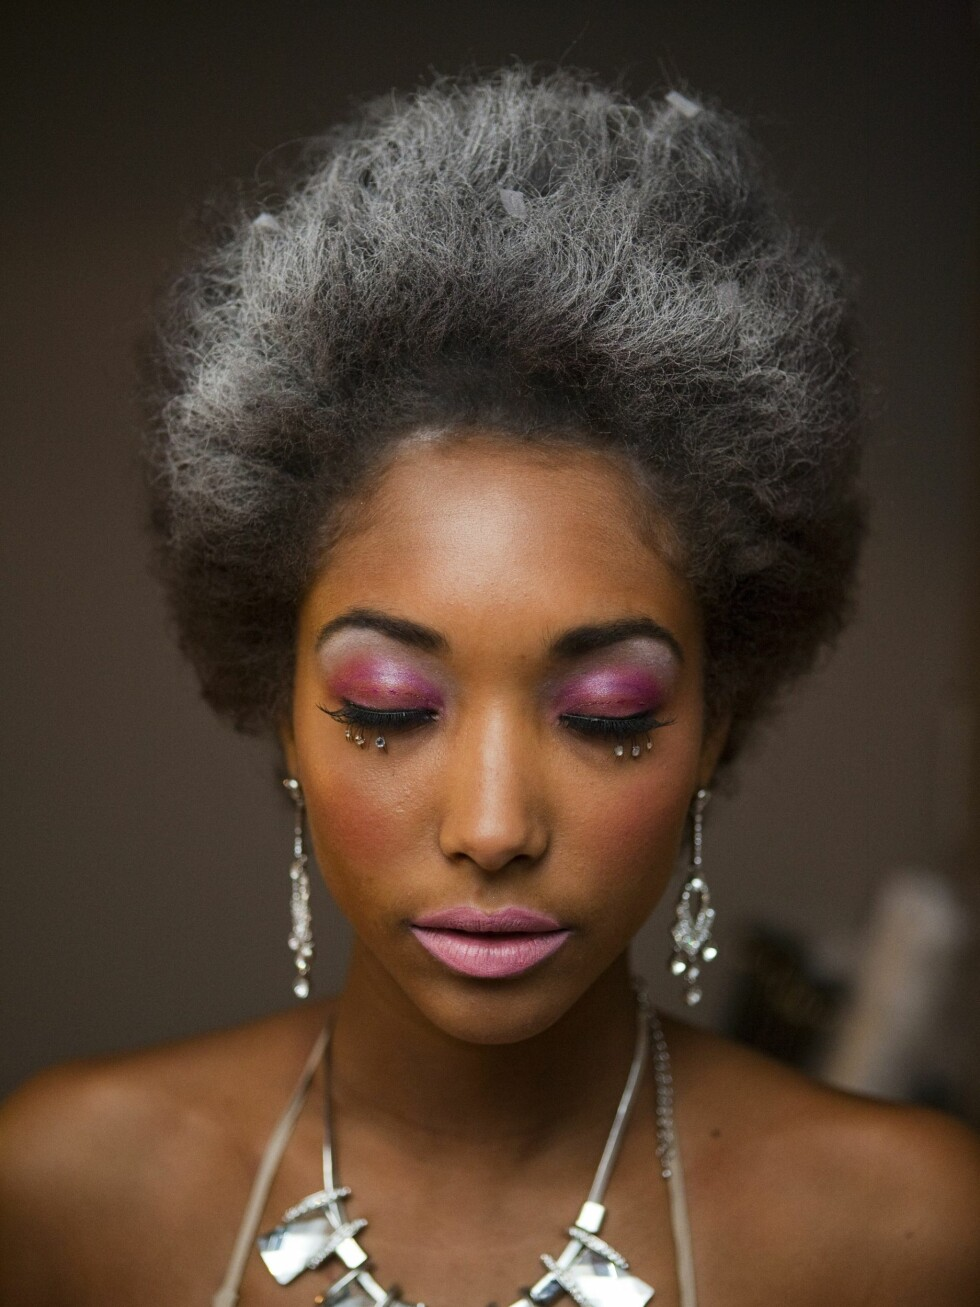 Rosa øyne og rosa lepper.  Foto: Per Ervland